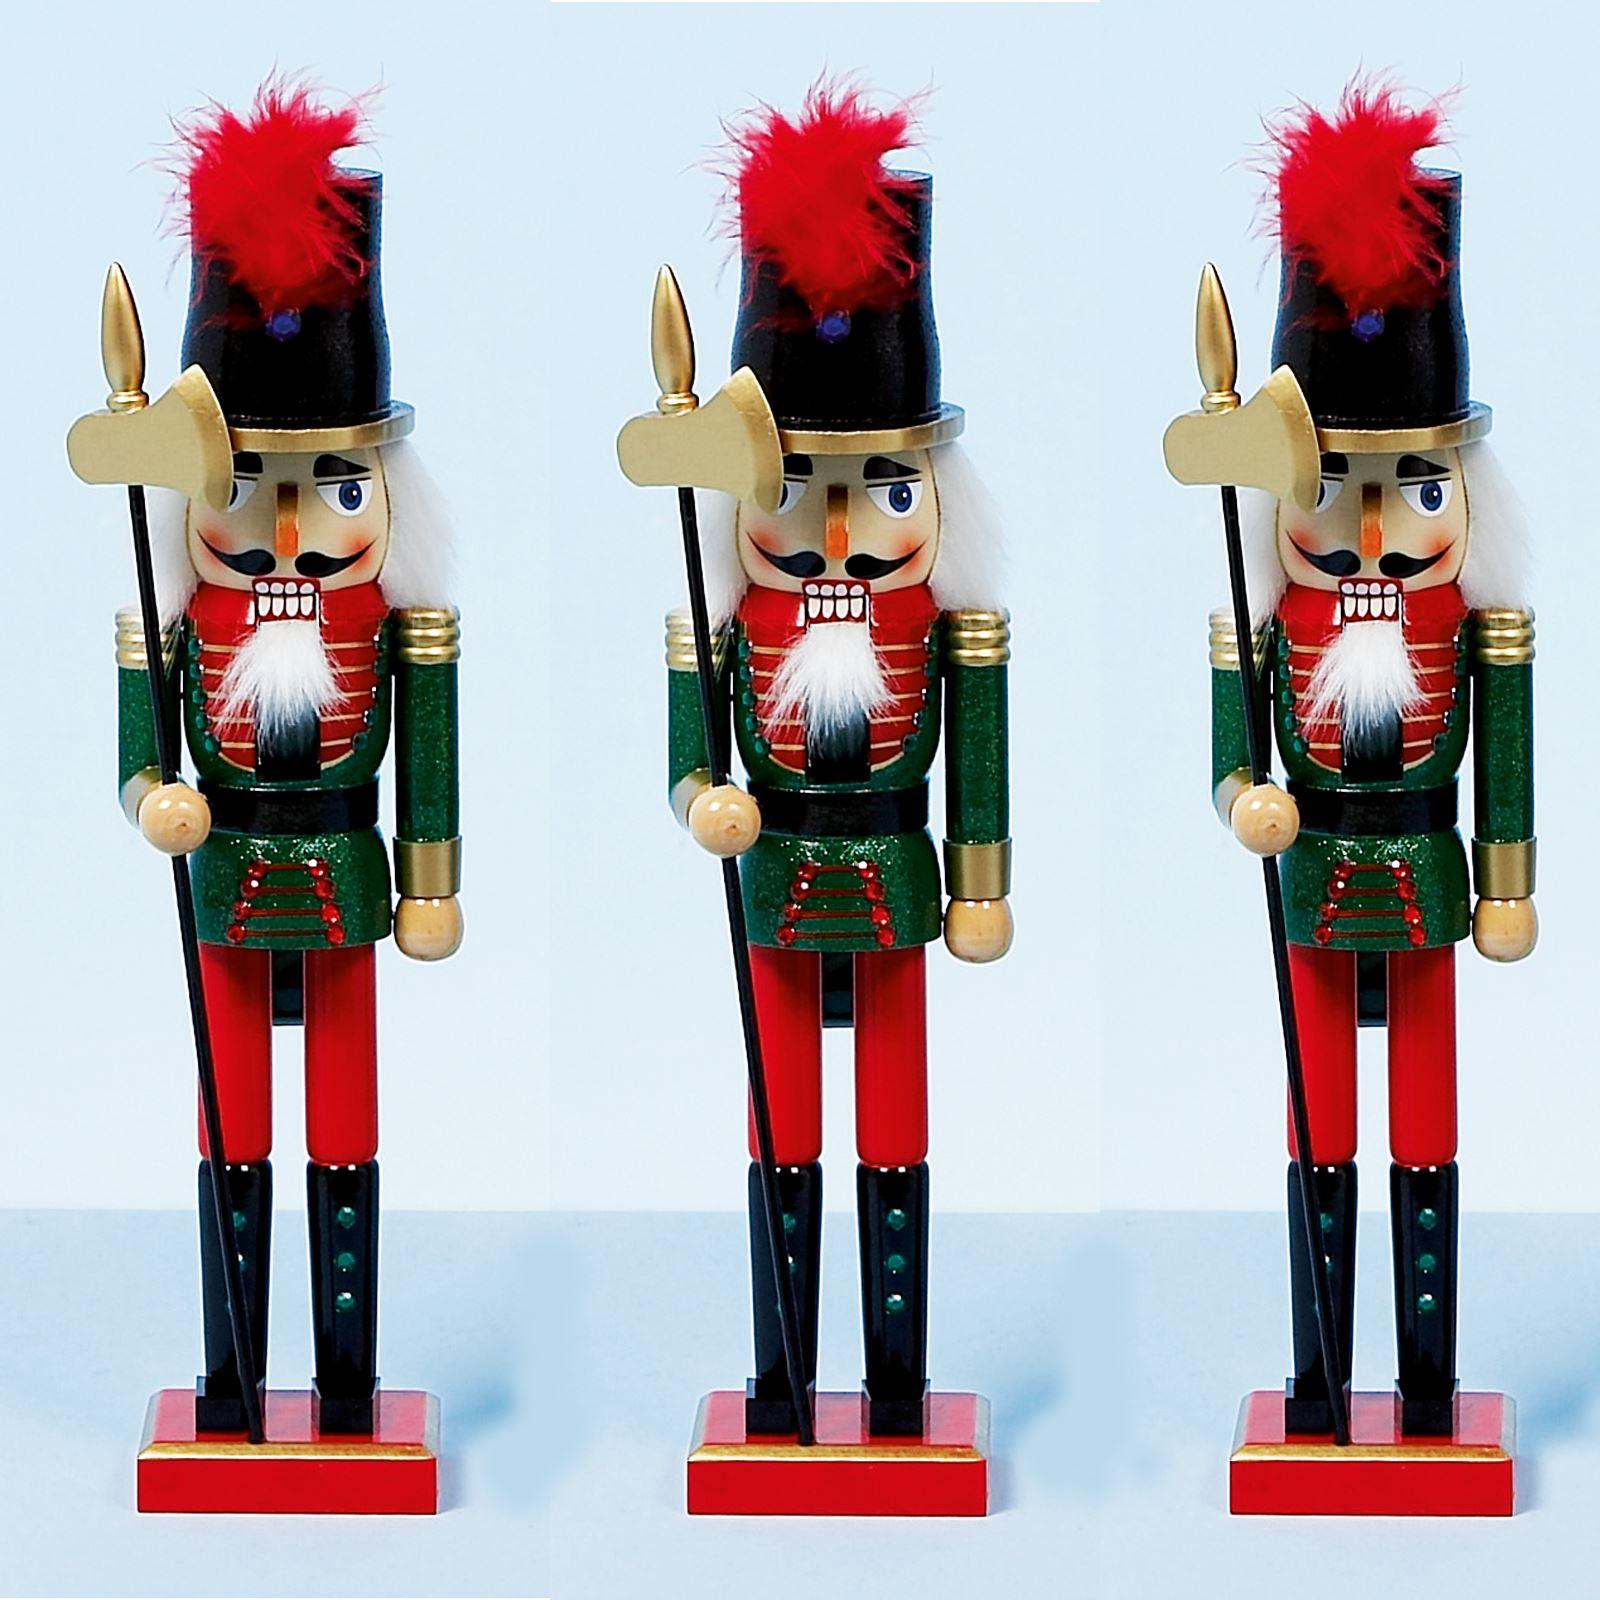 38CM XMAS CHRISTMAS TRADITIONAL STYLE NUTCRACKER WOODEN GUARD BALLET ...